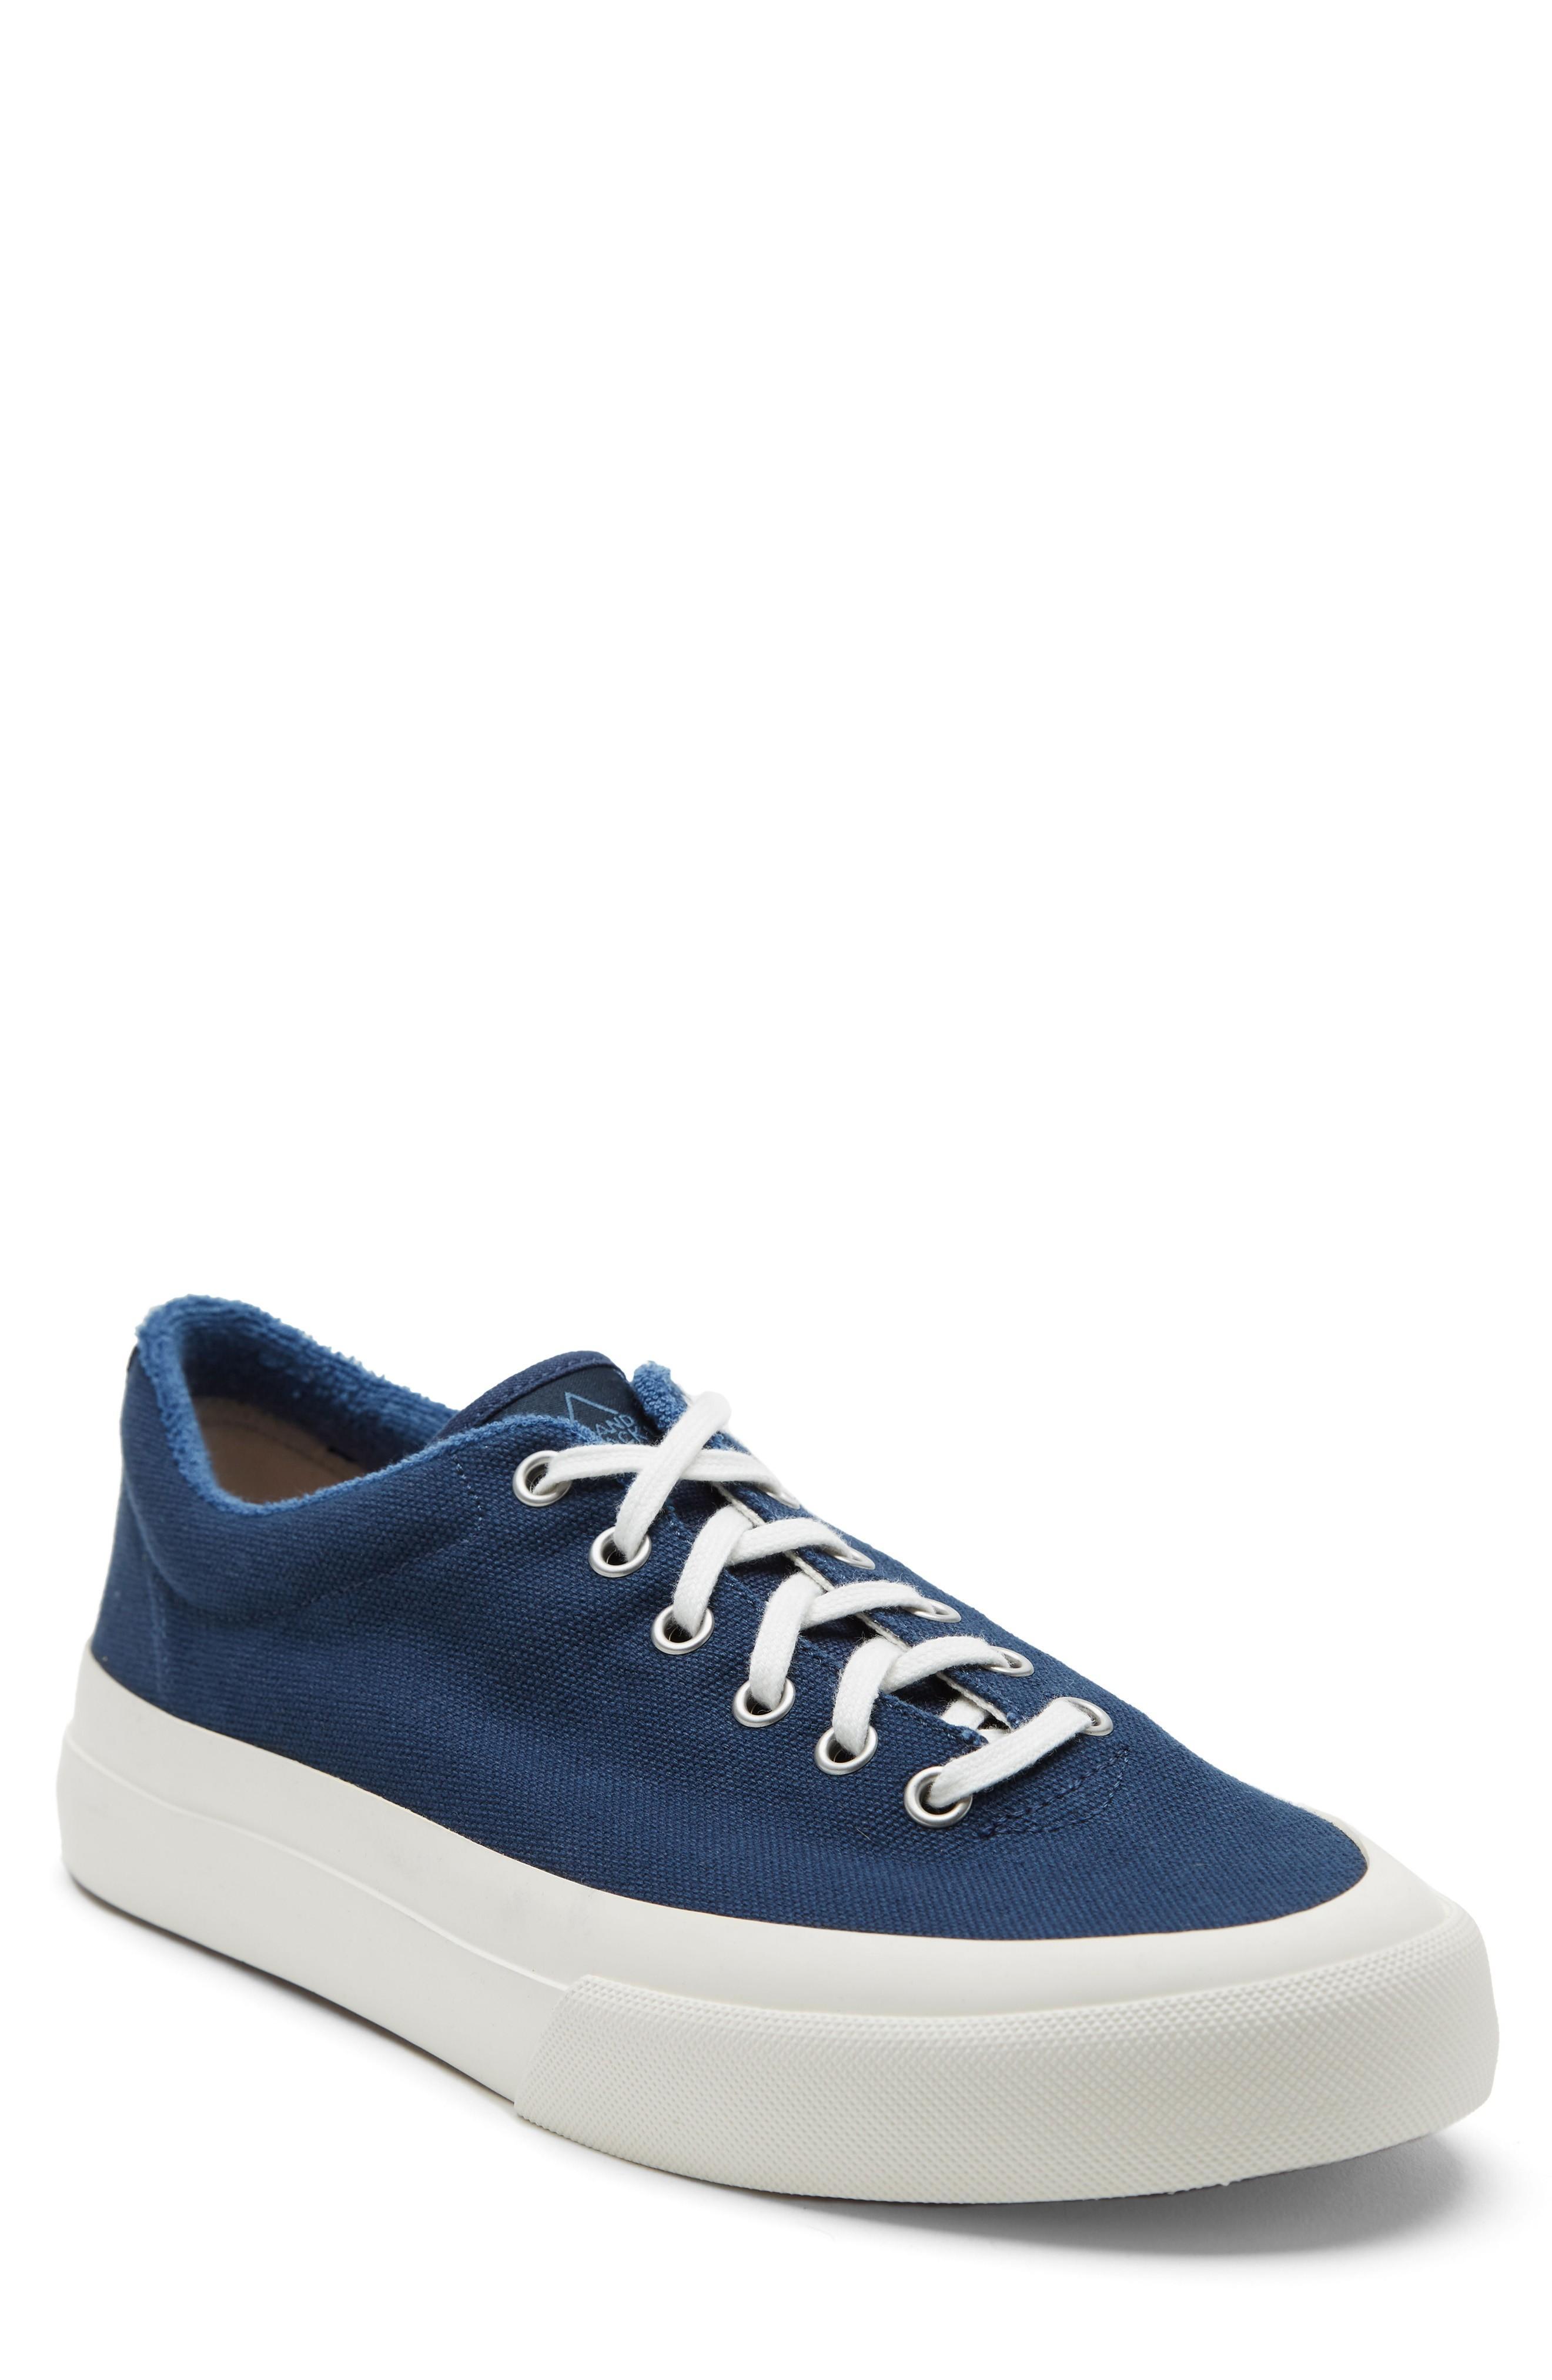 27c2e19418de Brandblack Vesta Low Top Sneaker In Navy